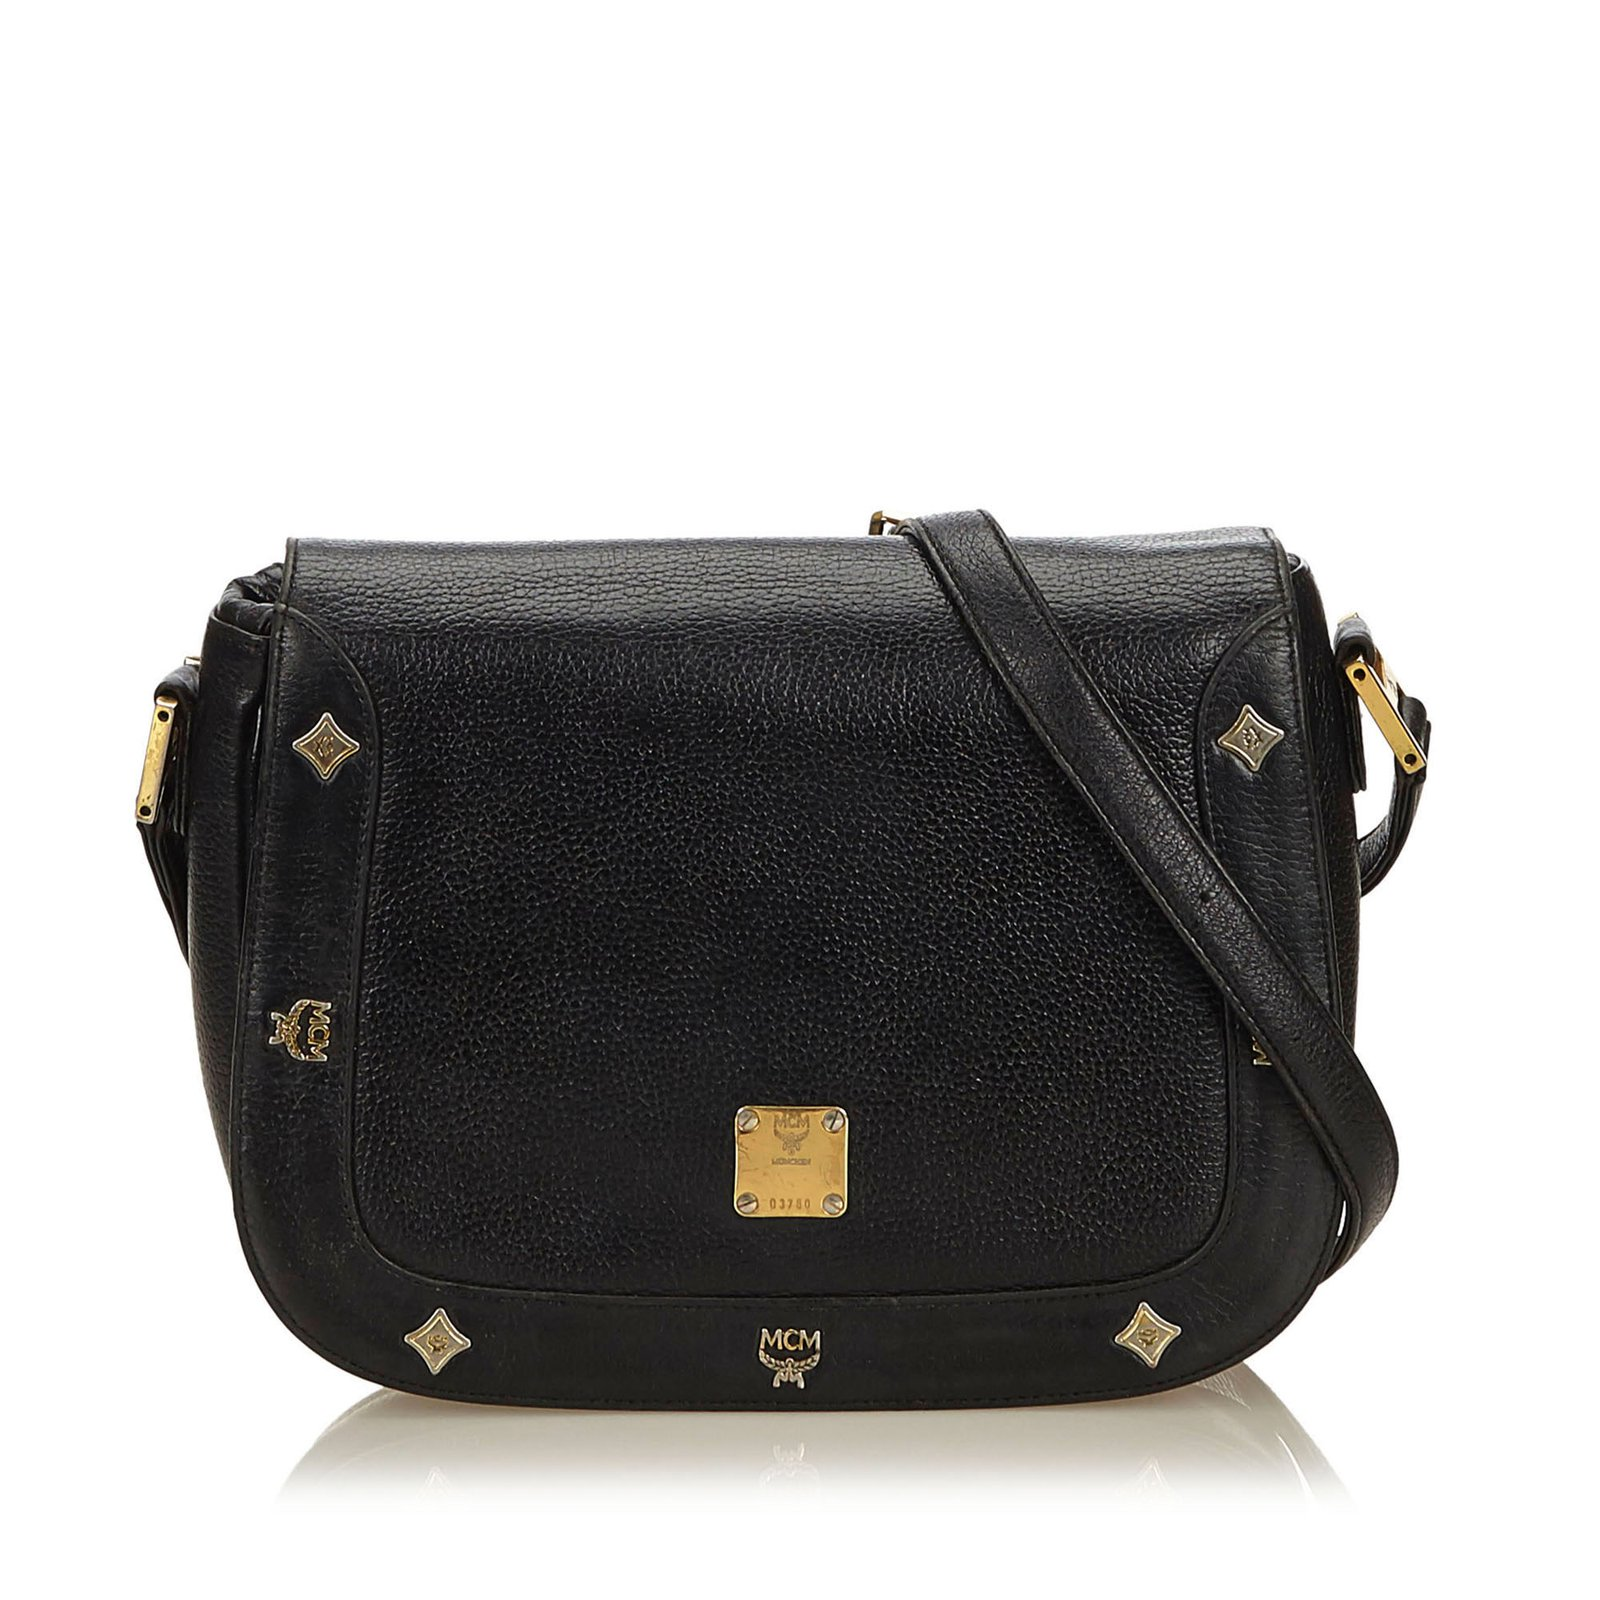 9057e4a6fbdc MCM Leather Crossbody Bag Handbags Leather,Other Black ref.99787 ...